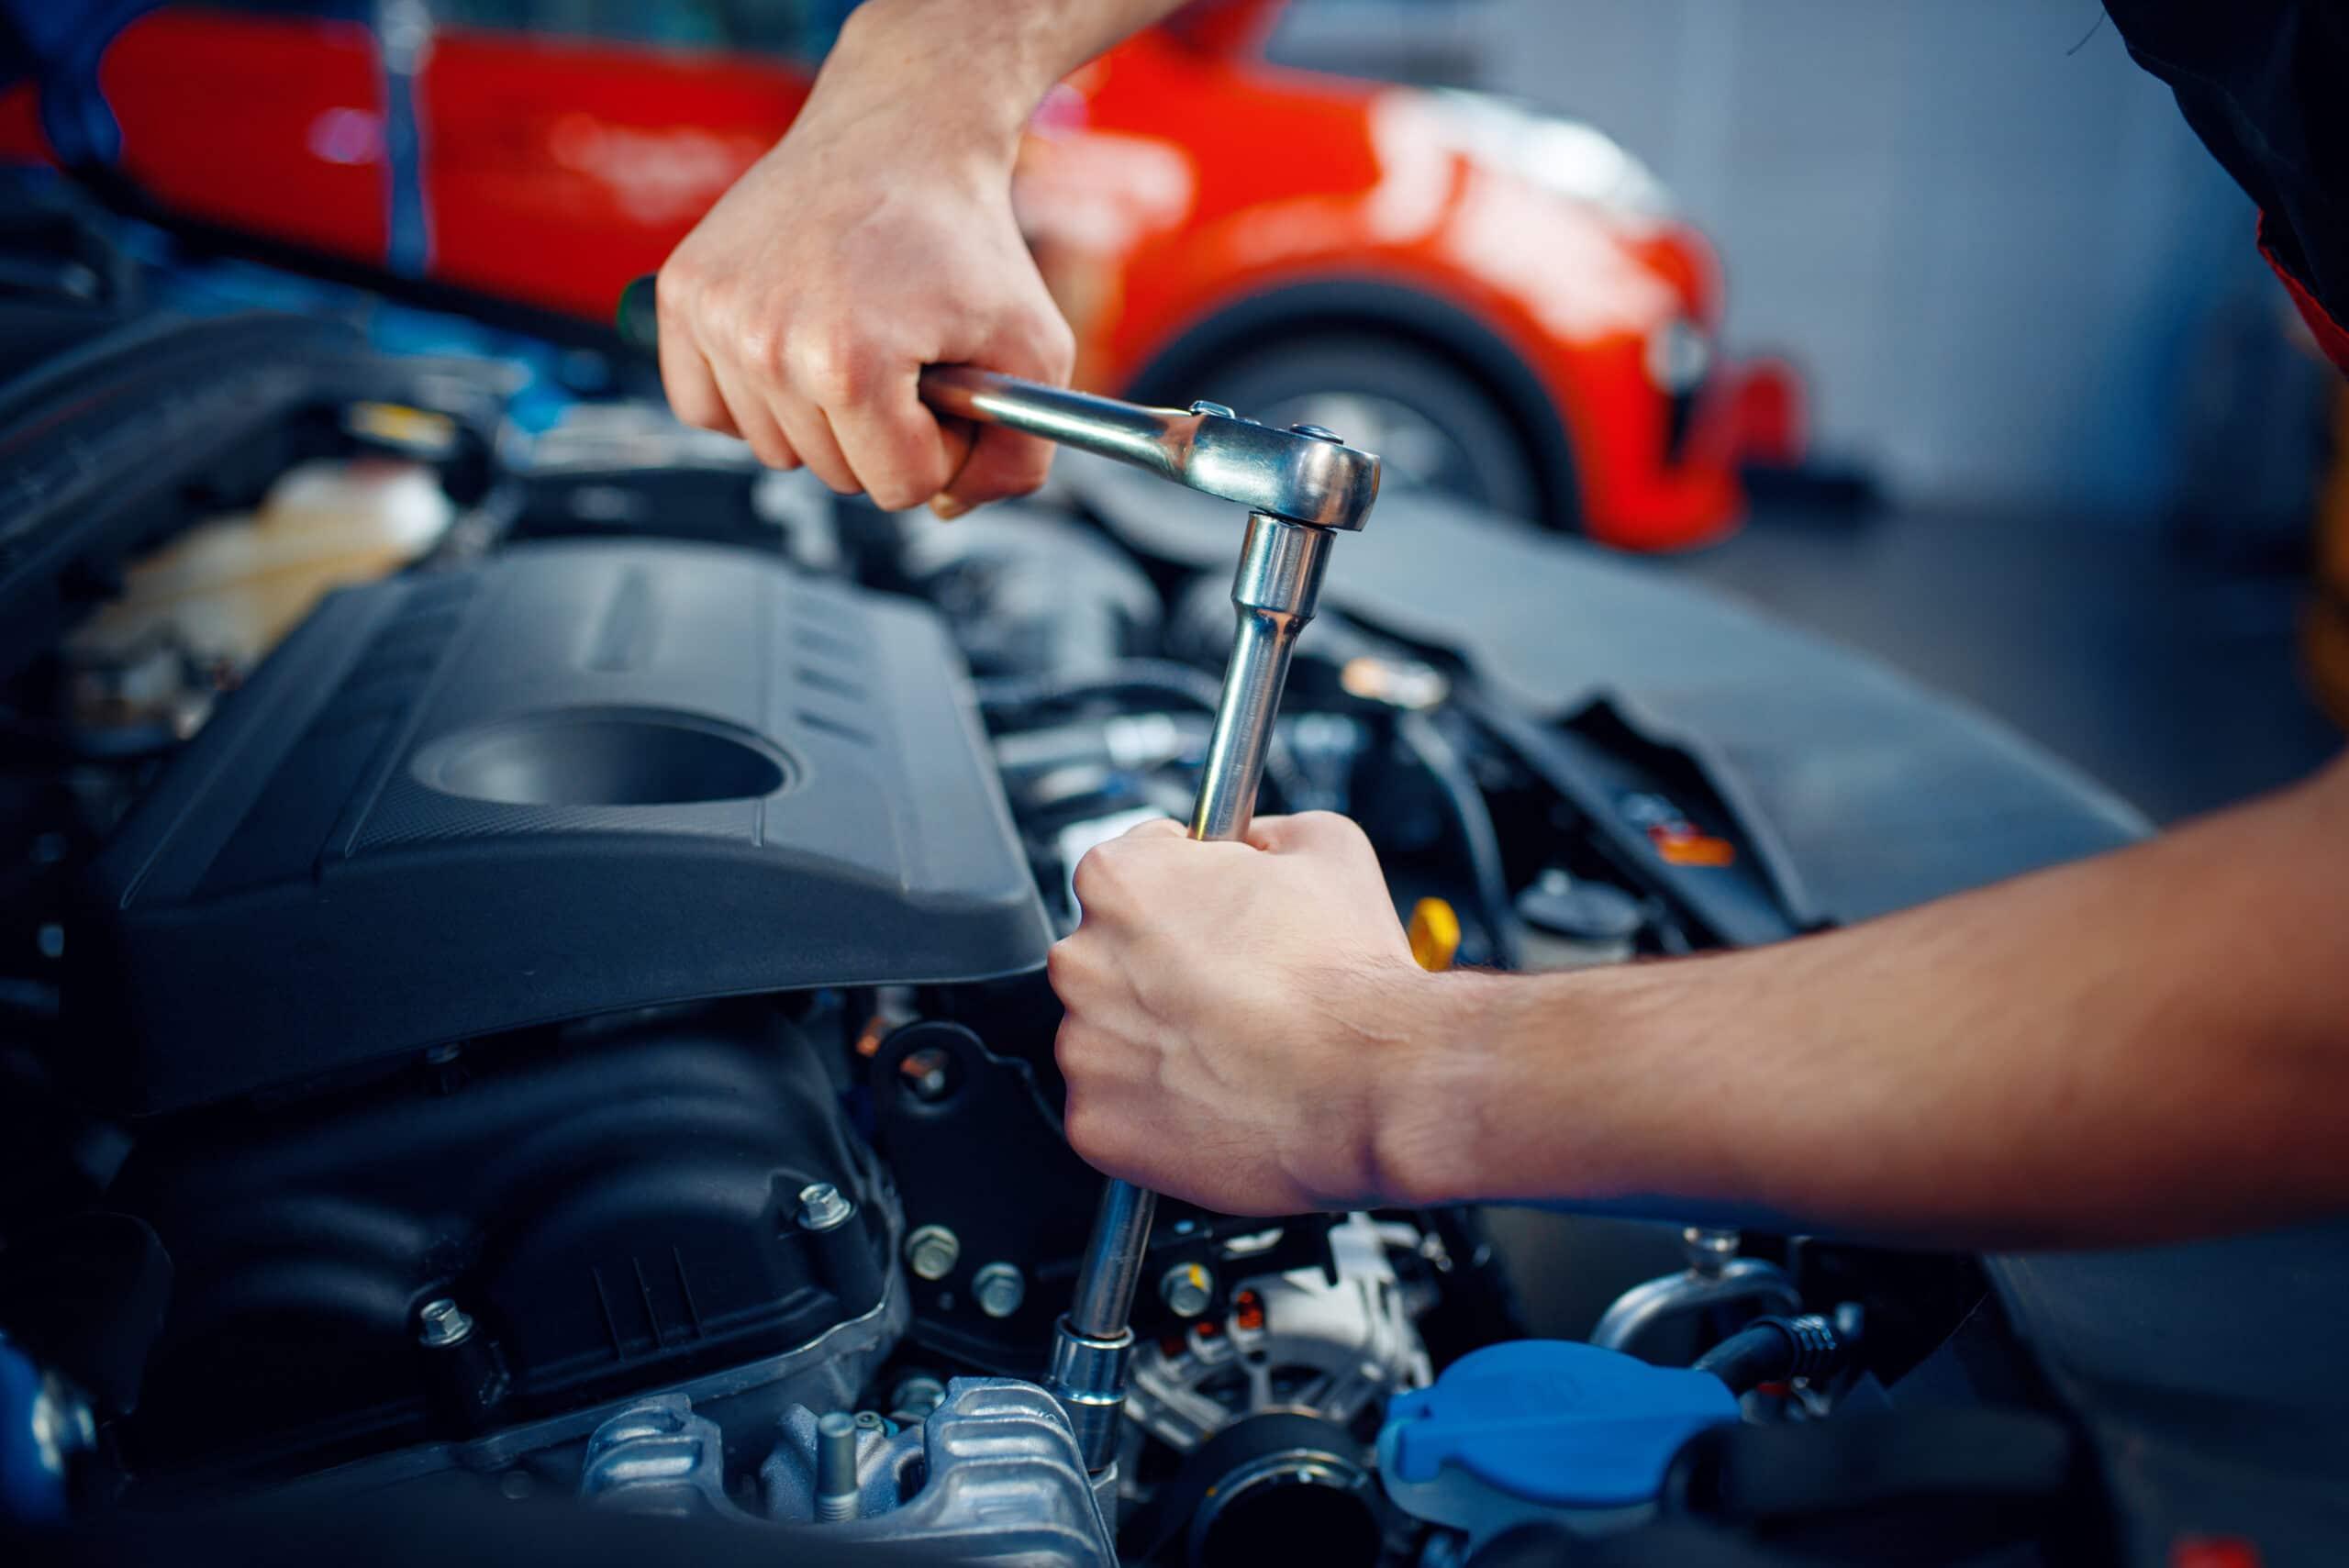 Engine Services Mechanic